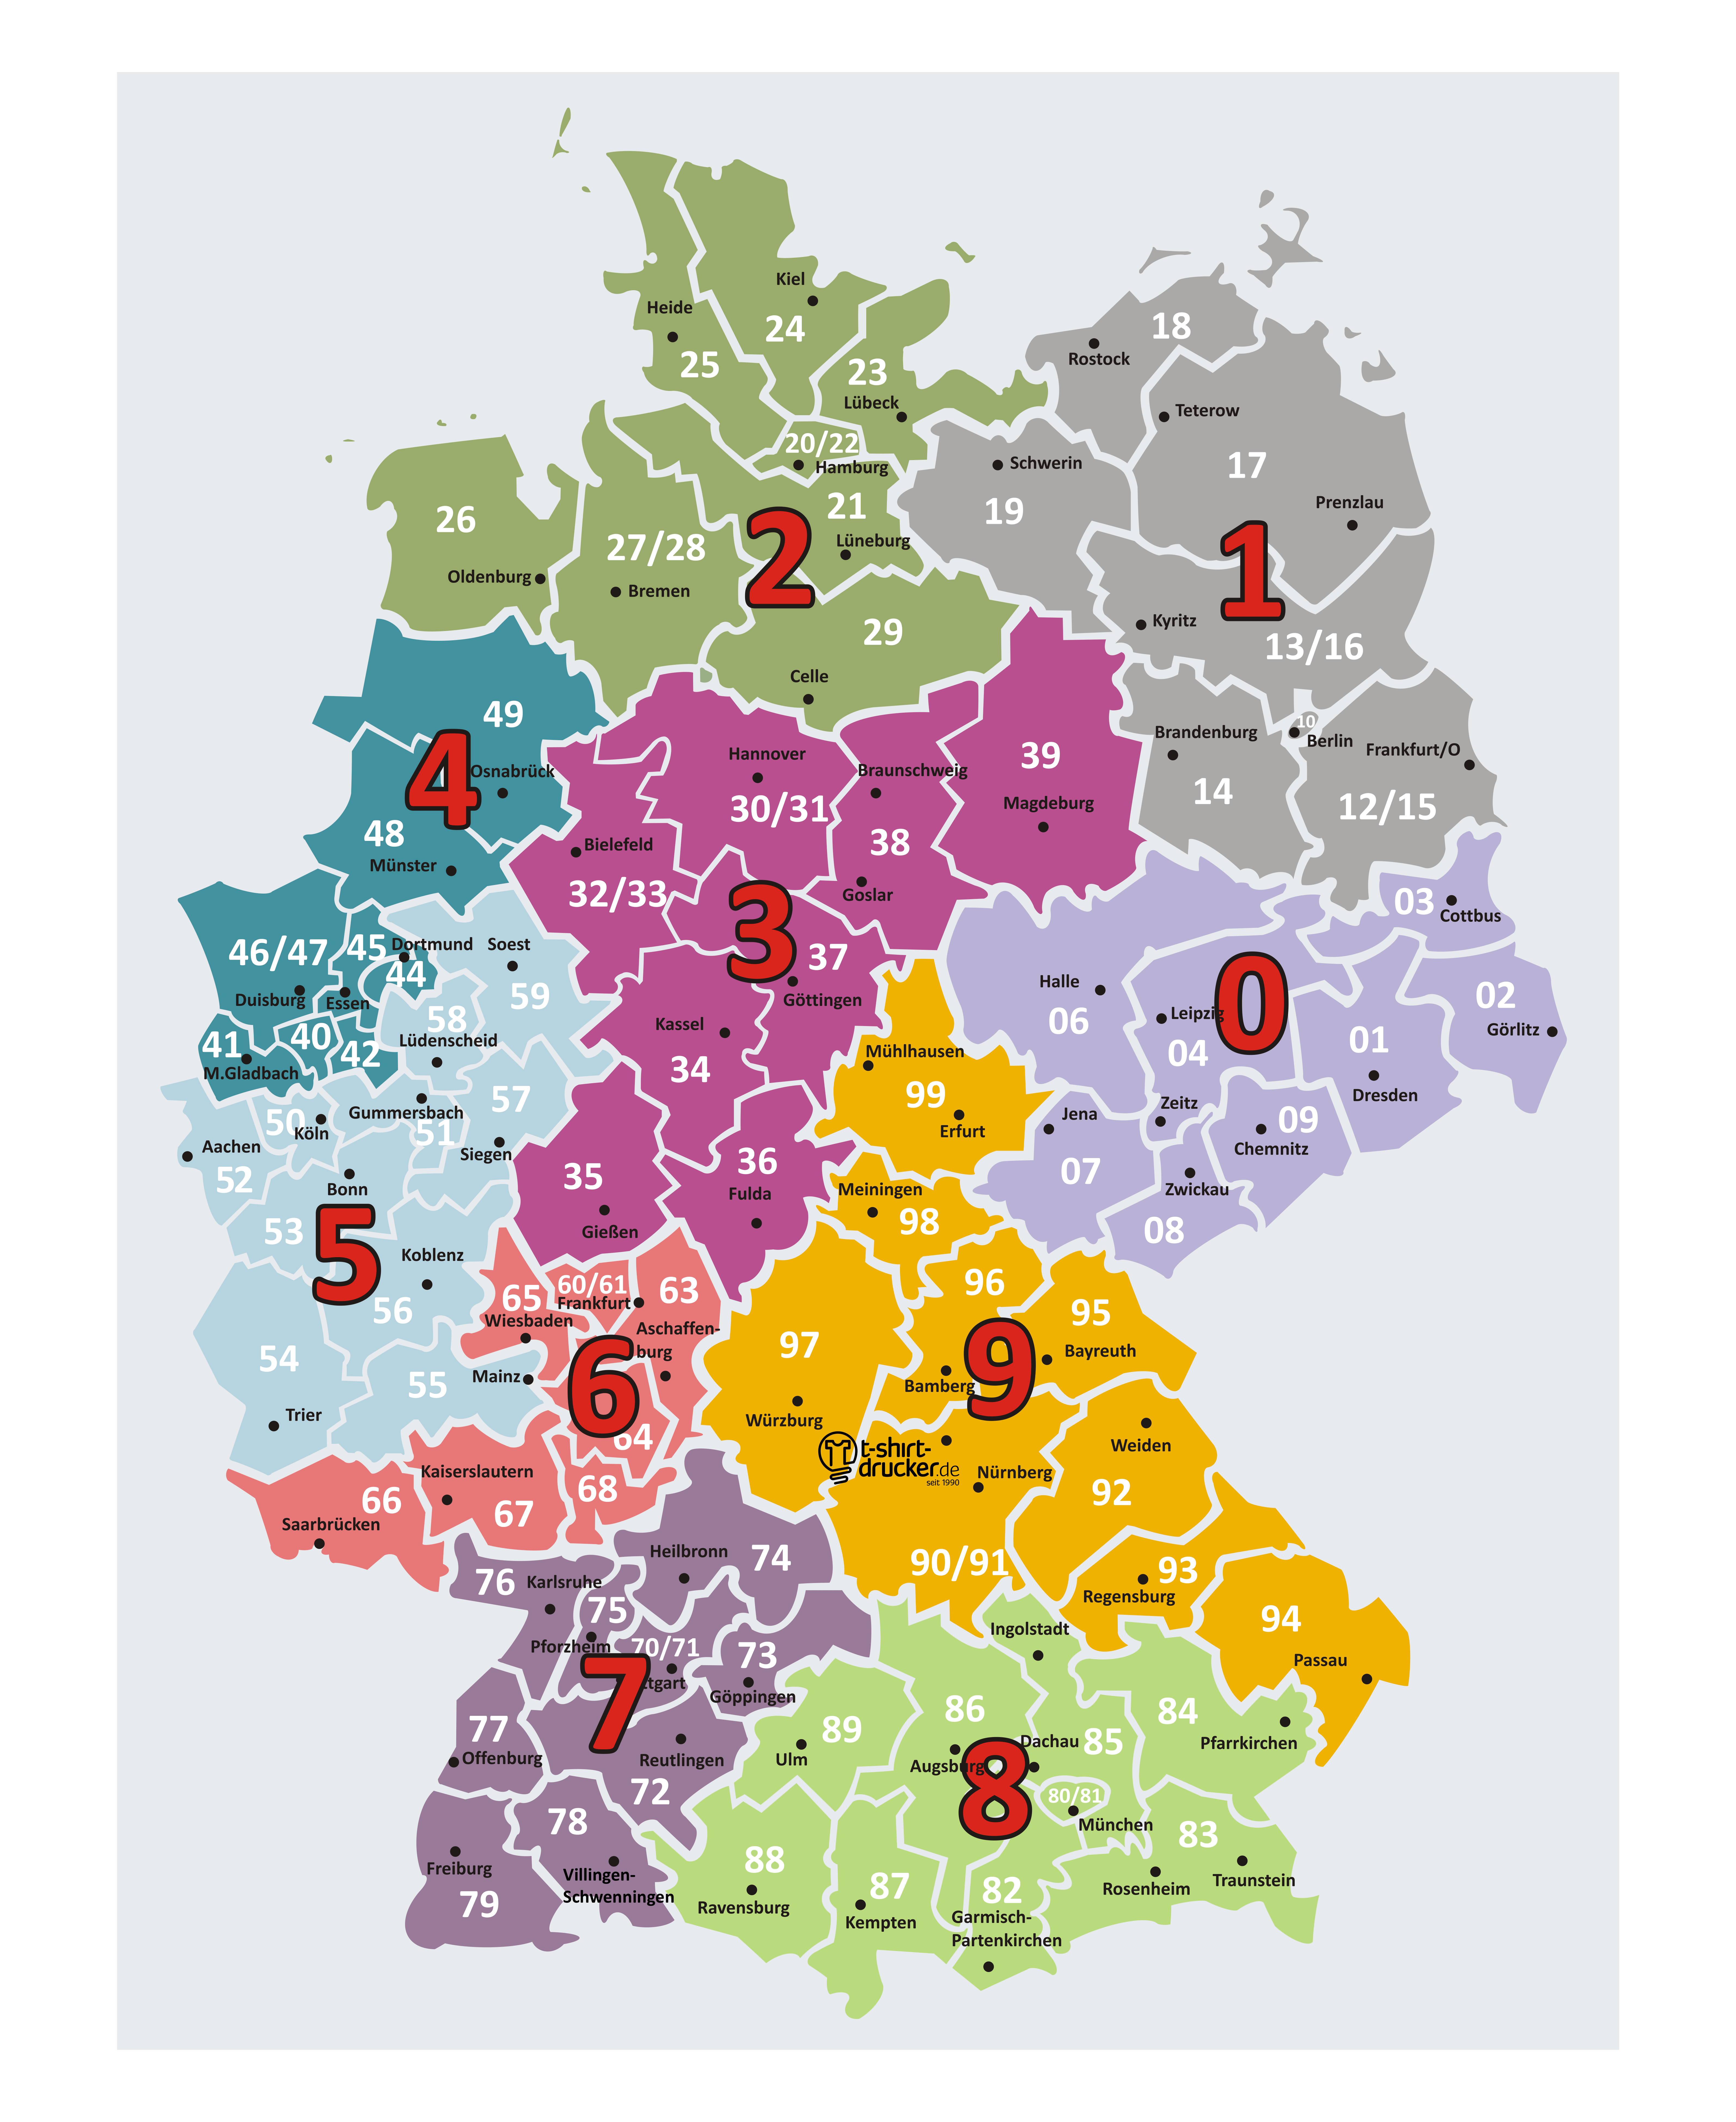 Karte Plz.Postleitzahlen Karte Plz Karte Venue Music